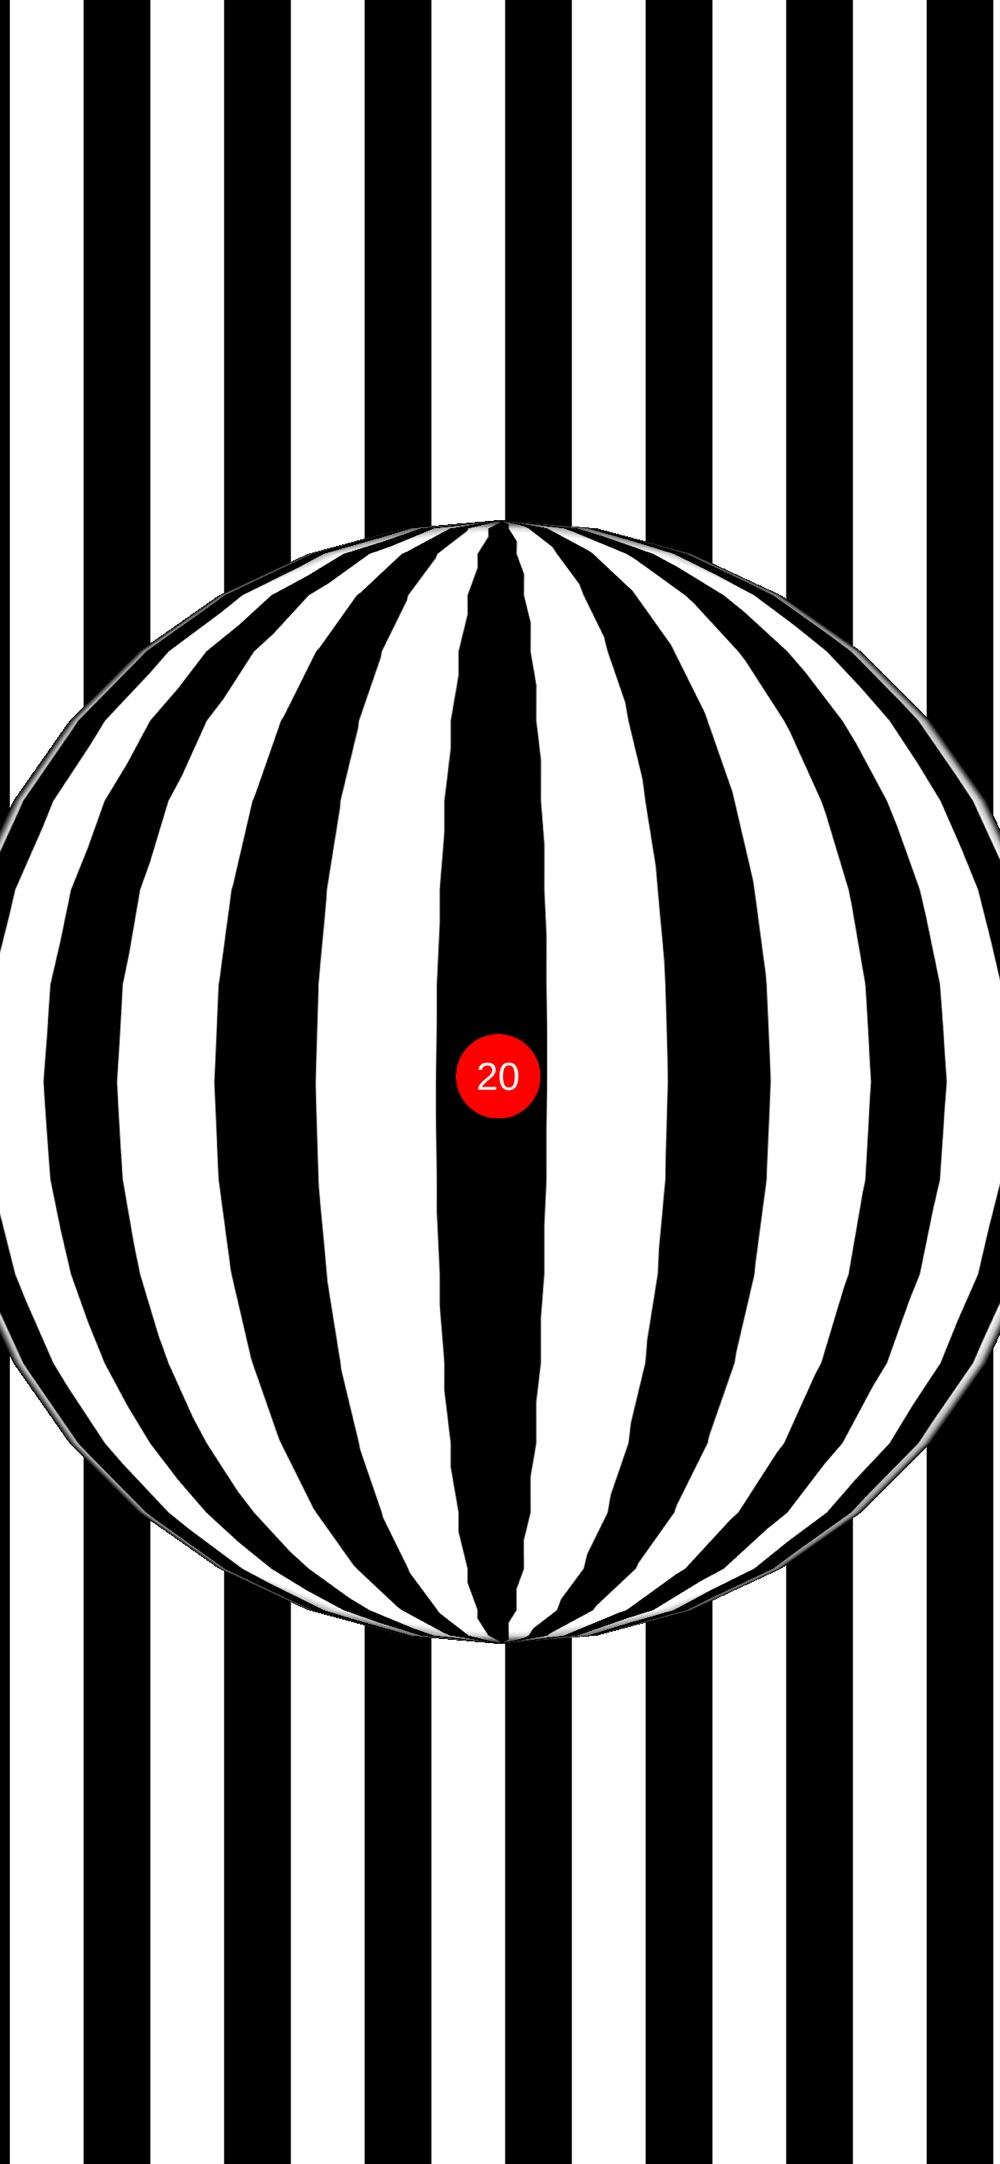 Optical illusion hypnosis hack tool